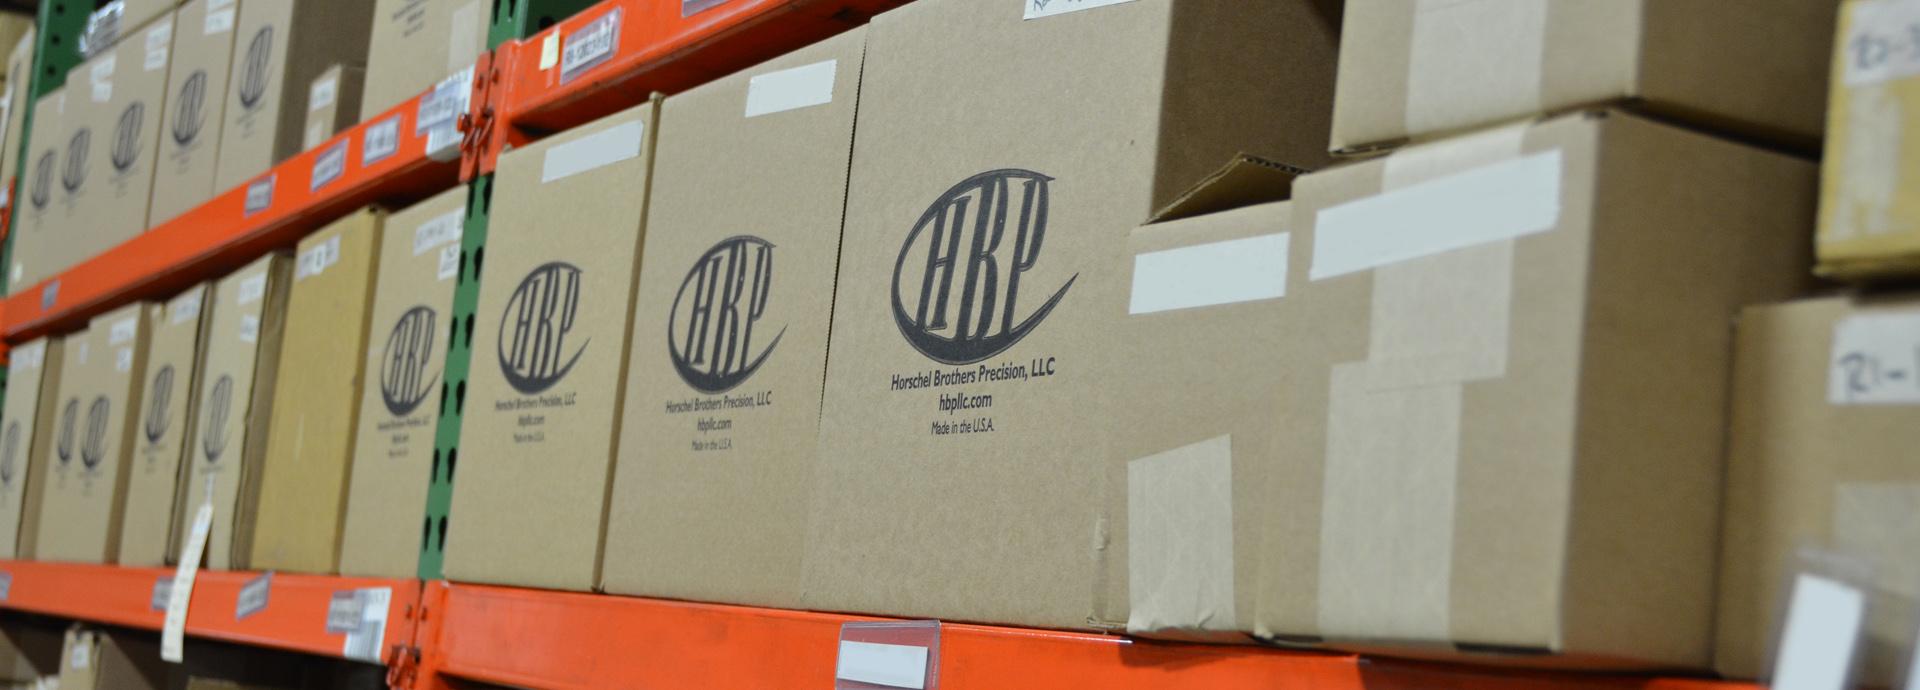 Inventory Management   Horschel Brothers Precision